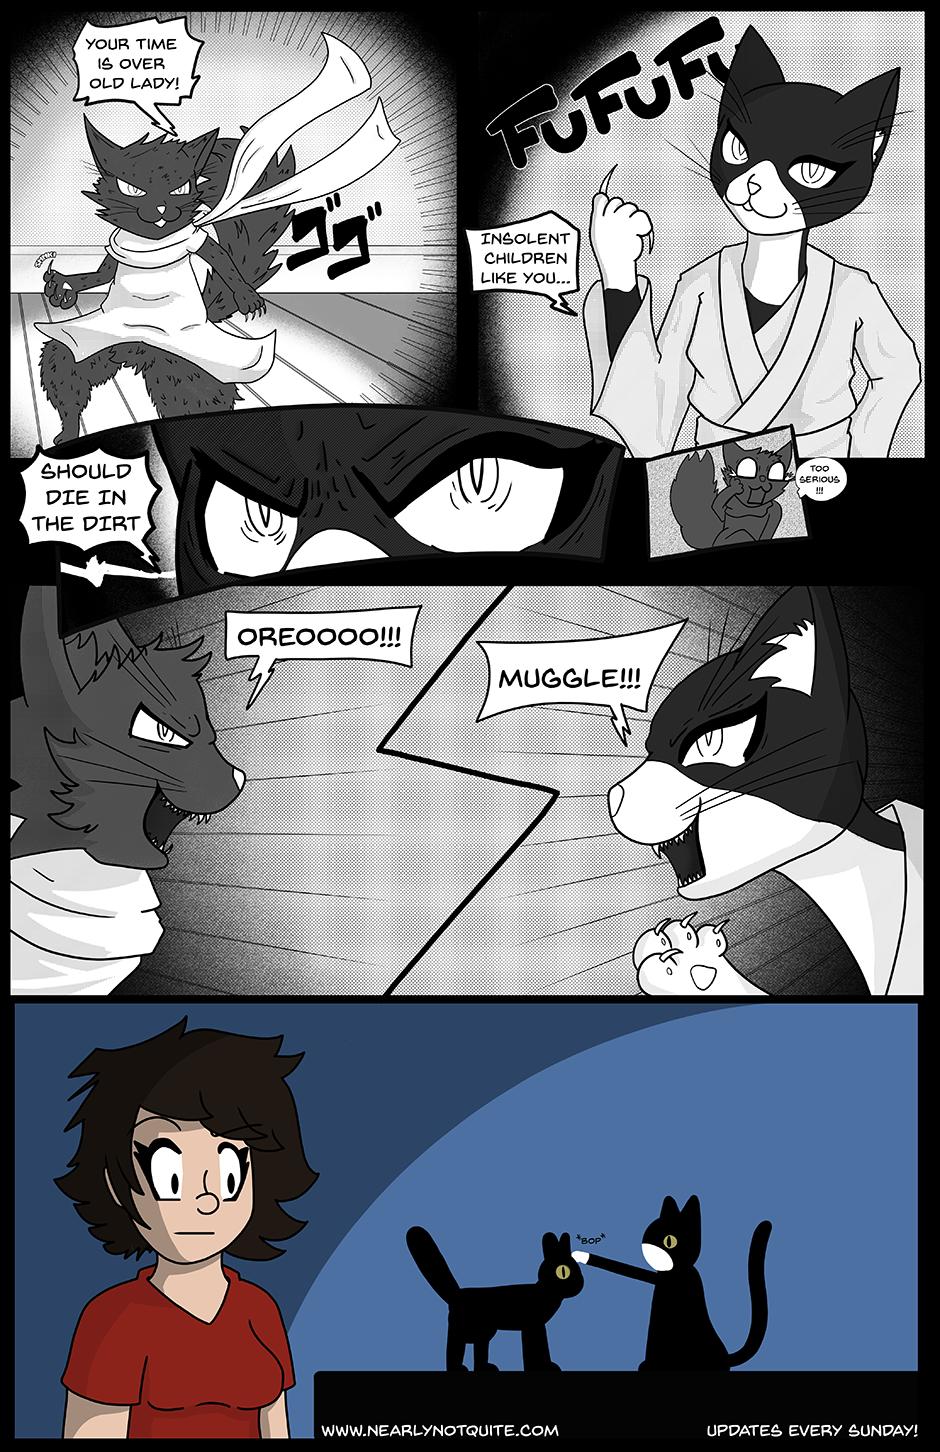 Muggle's Bizarre Adventure